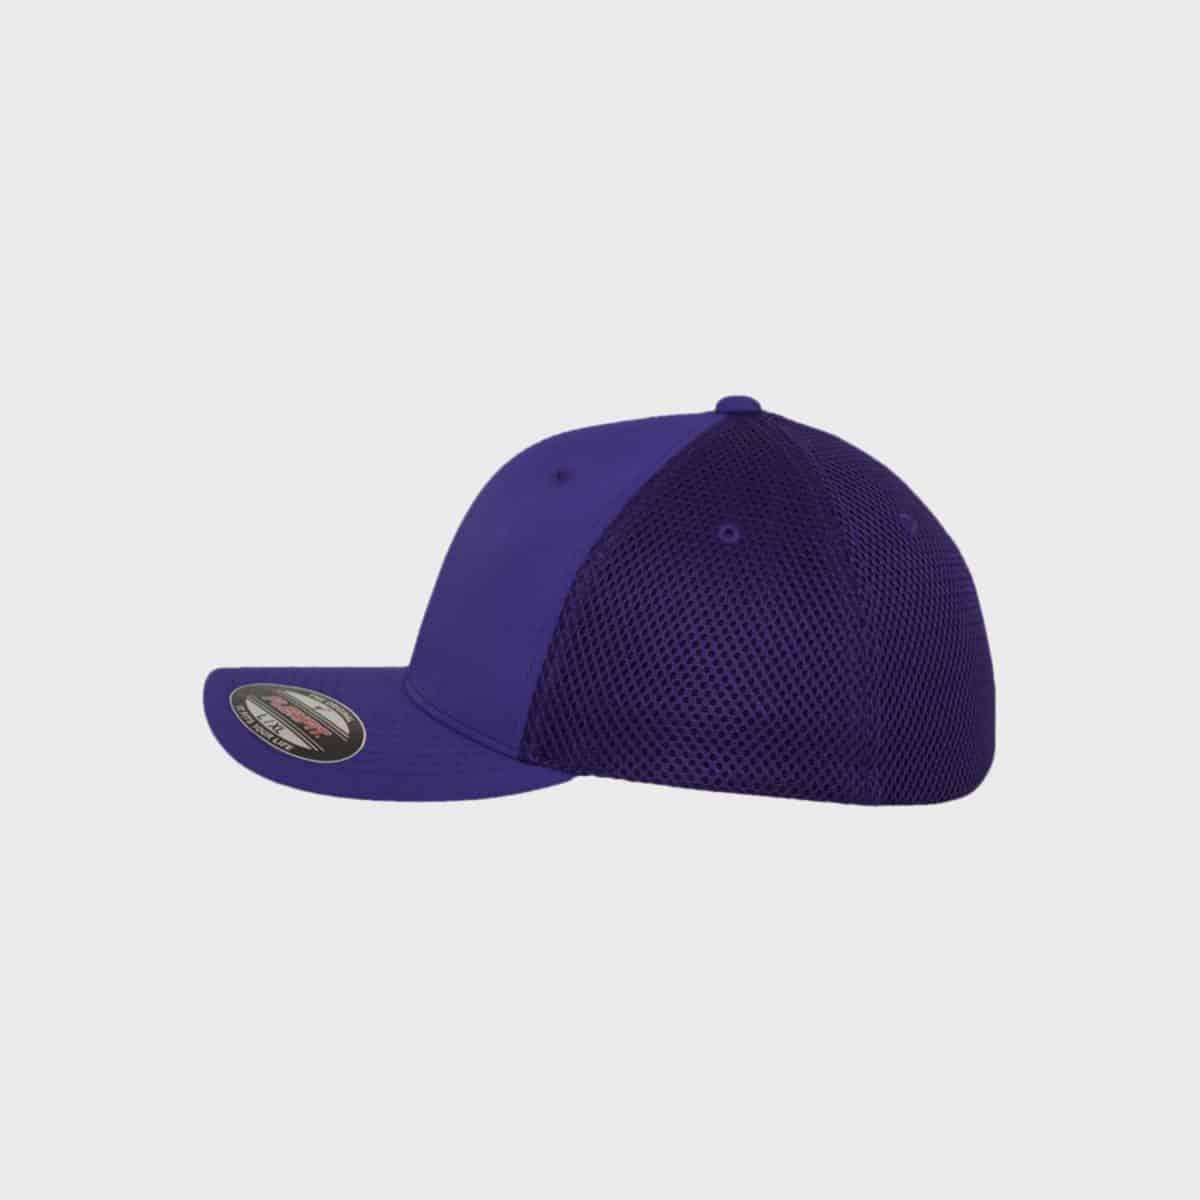 Flexfit FlexfitCaps FFE 6533 Purple Side